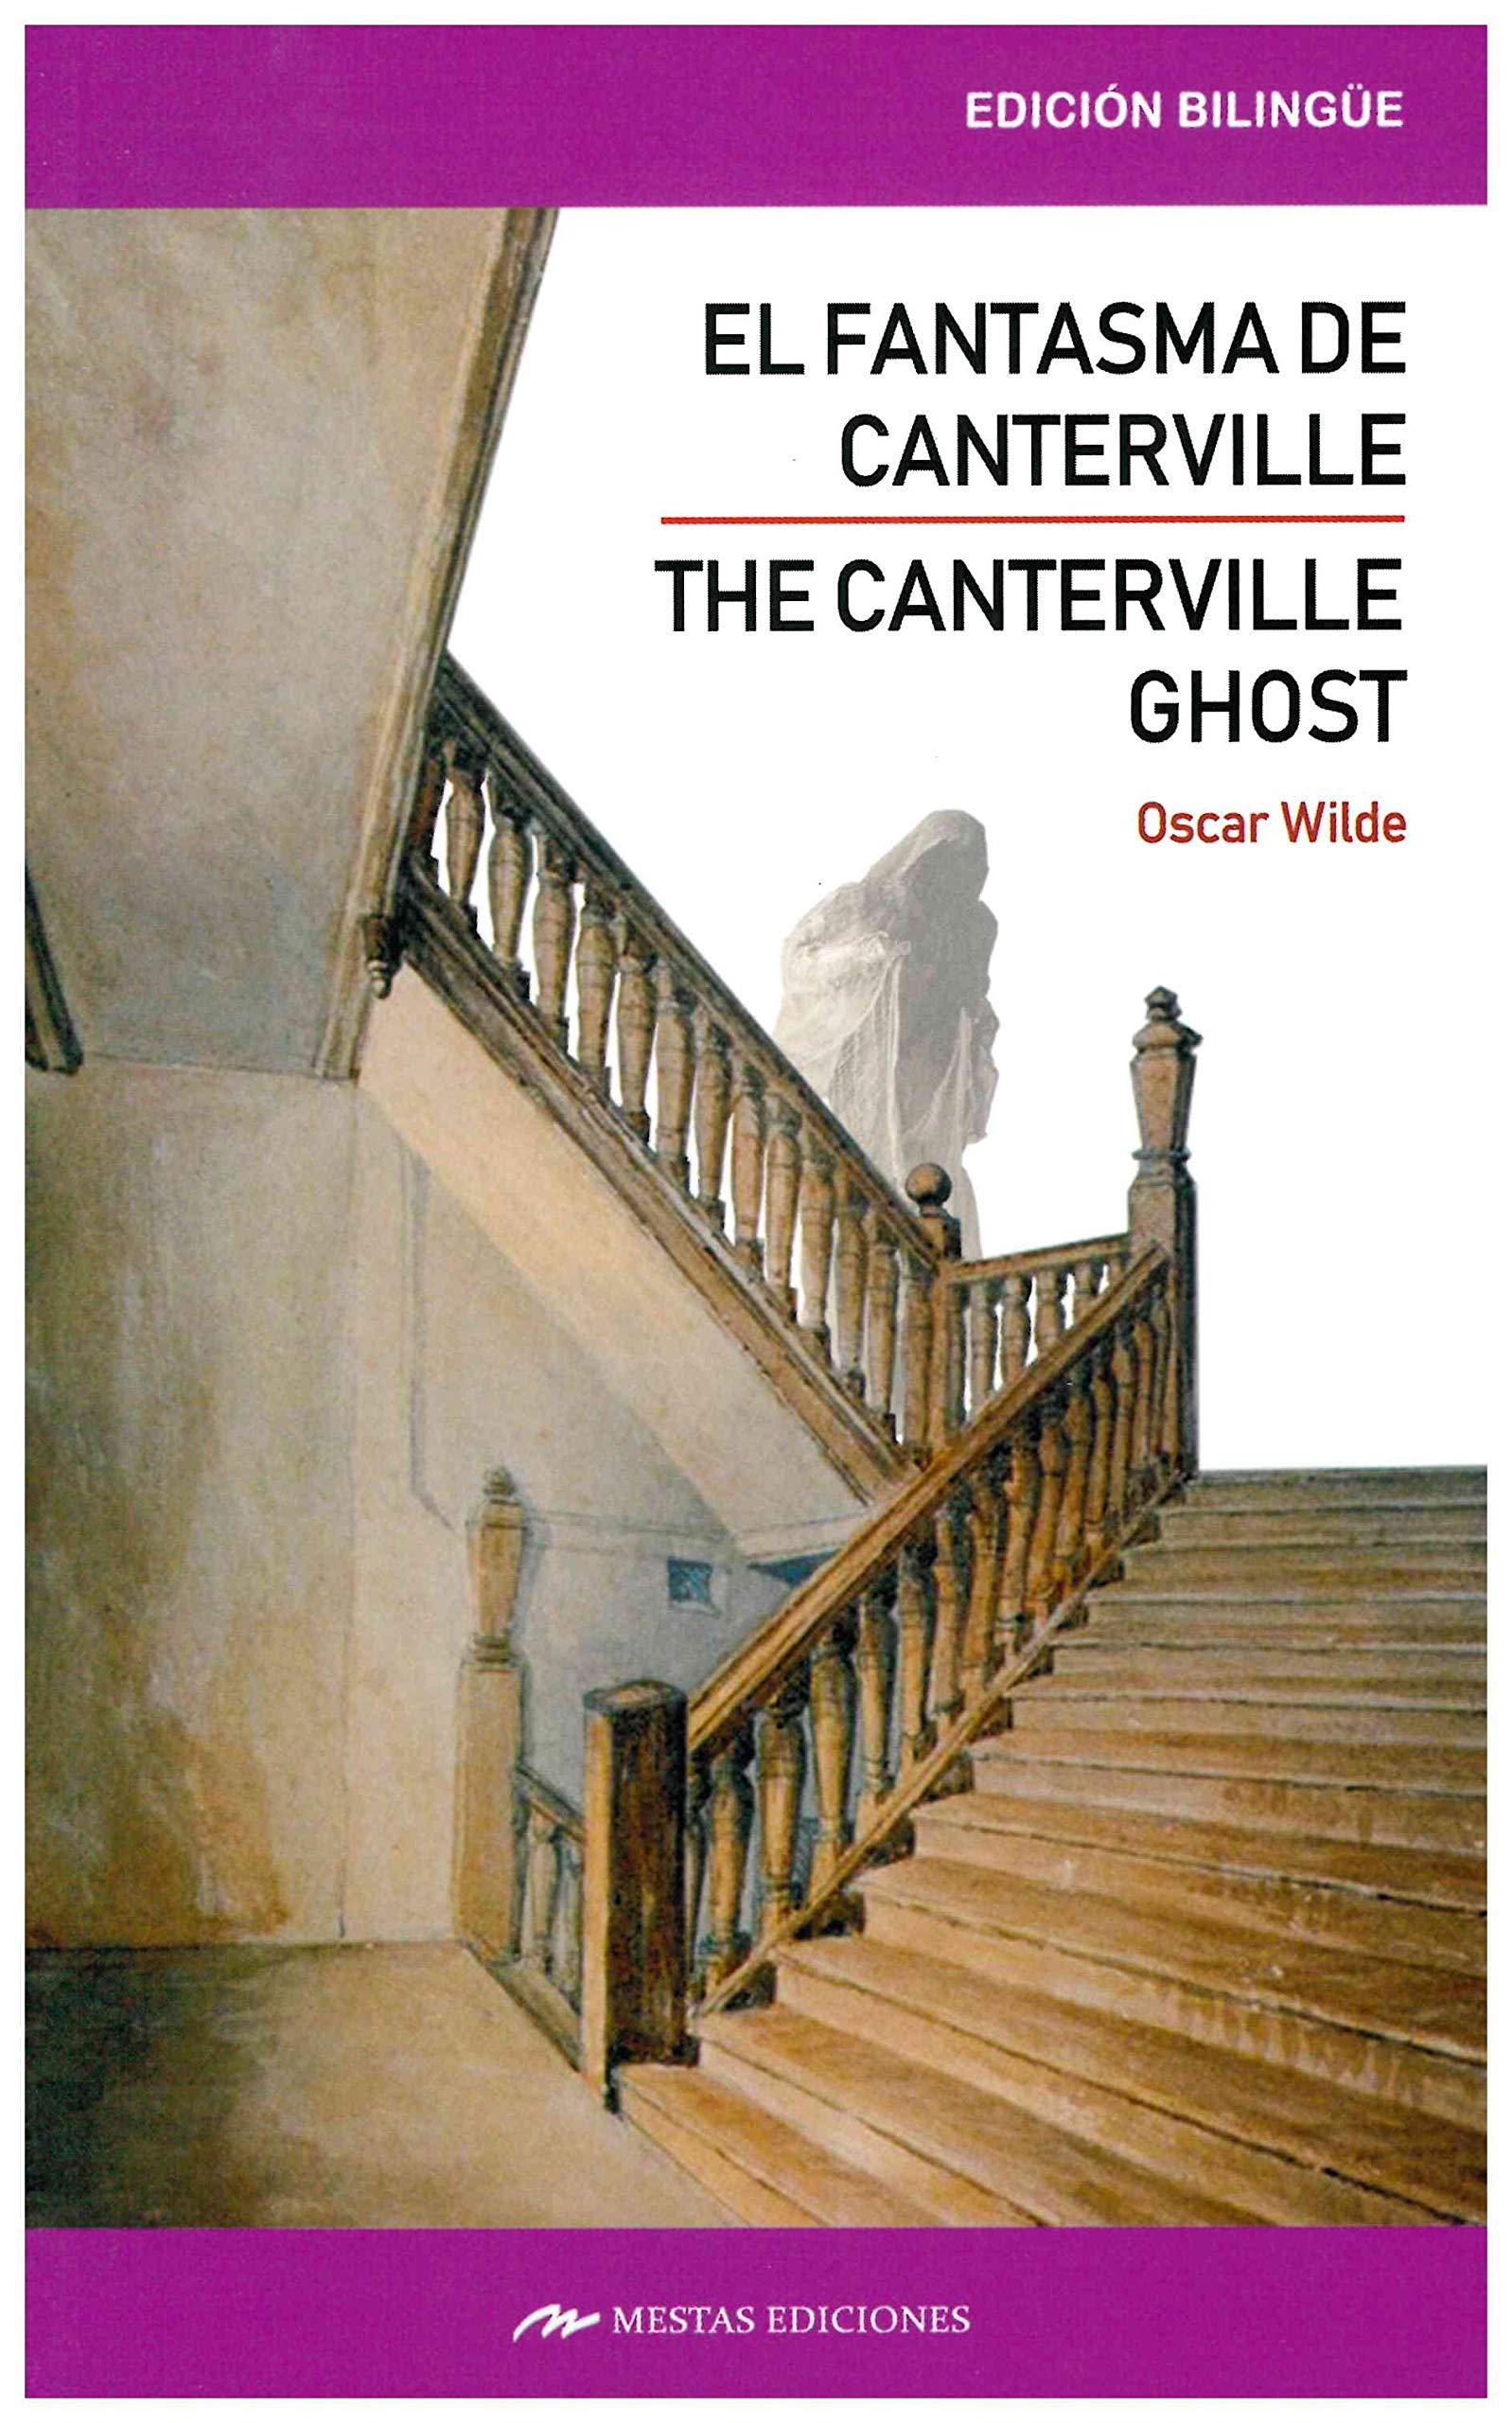 El Fantasma de Canterville/ The Canternille Ghost ed. Bilingüe : 4 Clásicos Bilingües: Amazon.es: Wilde, Oscar, Baéz Sanabria, María Elena: Libros